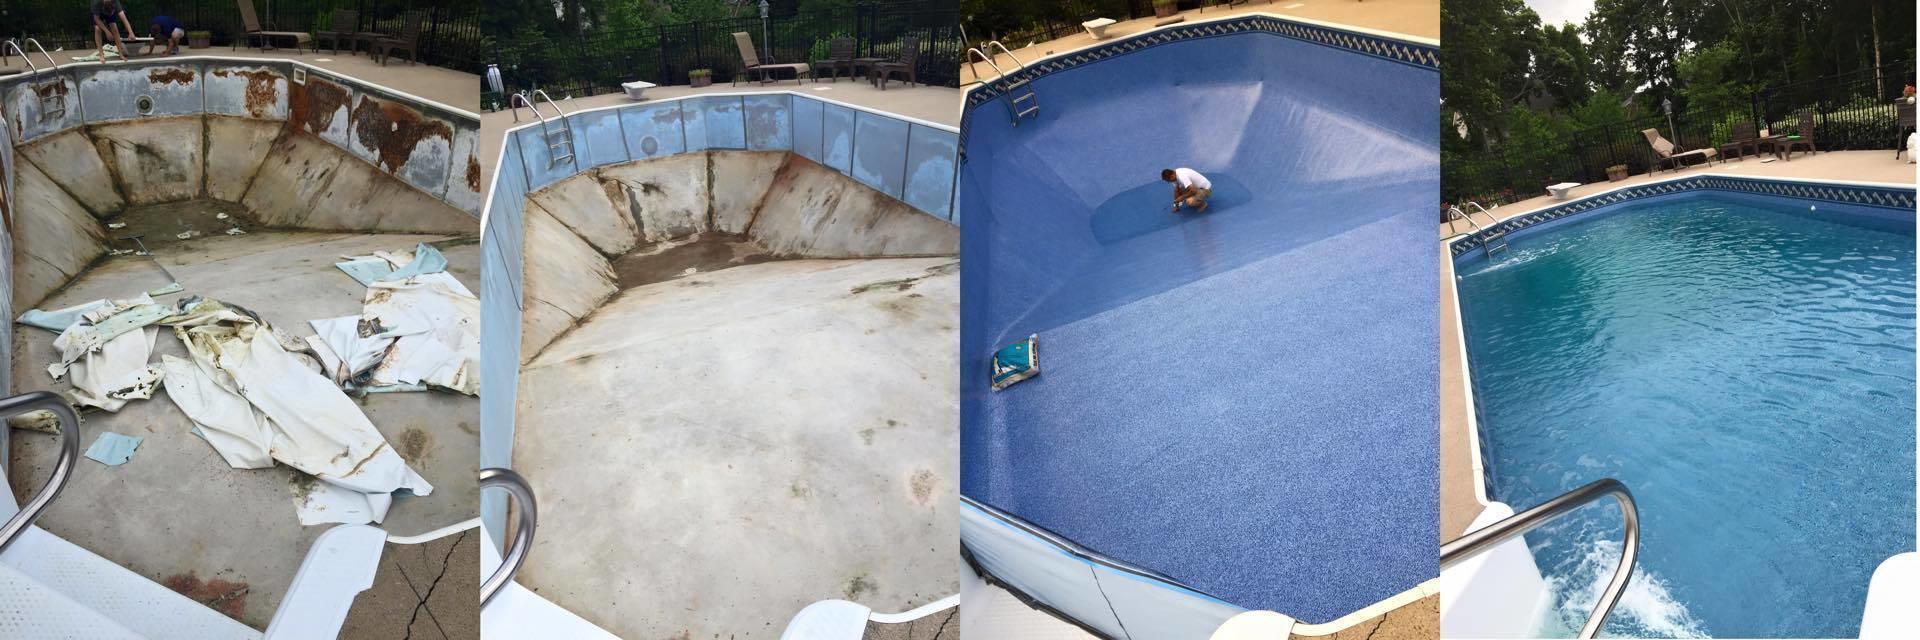 Sparkle Clean Pools image 3